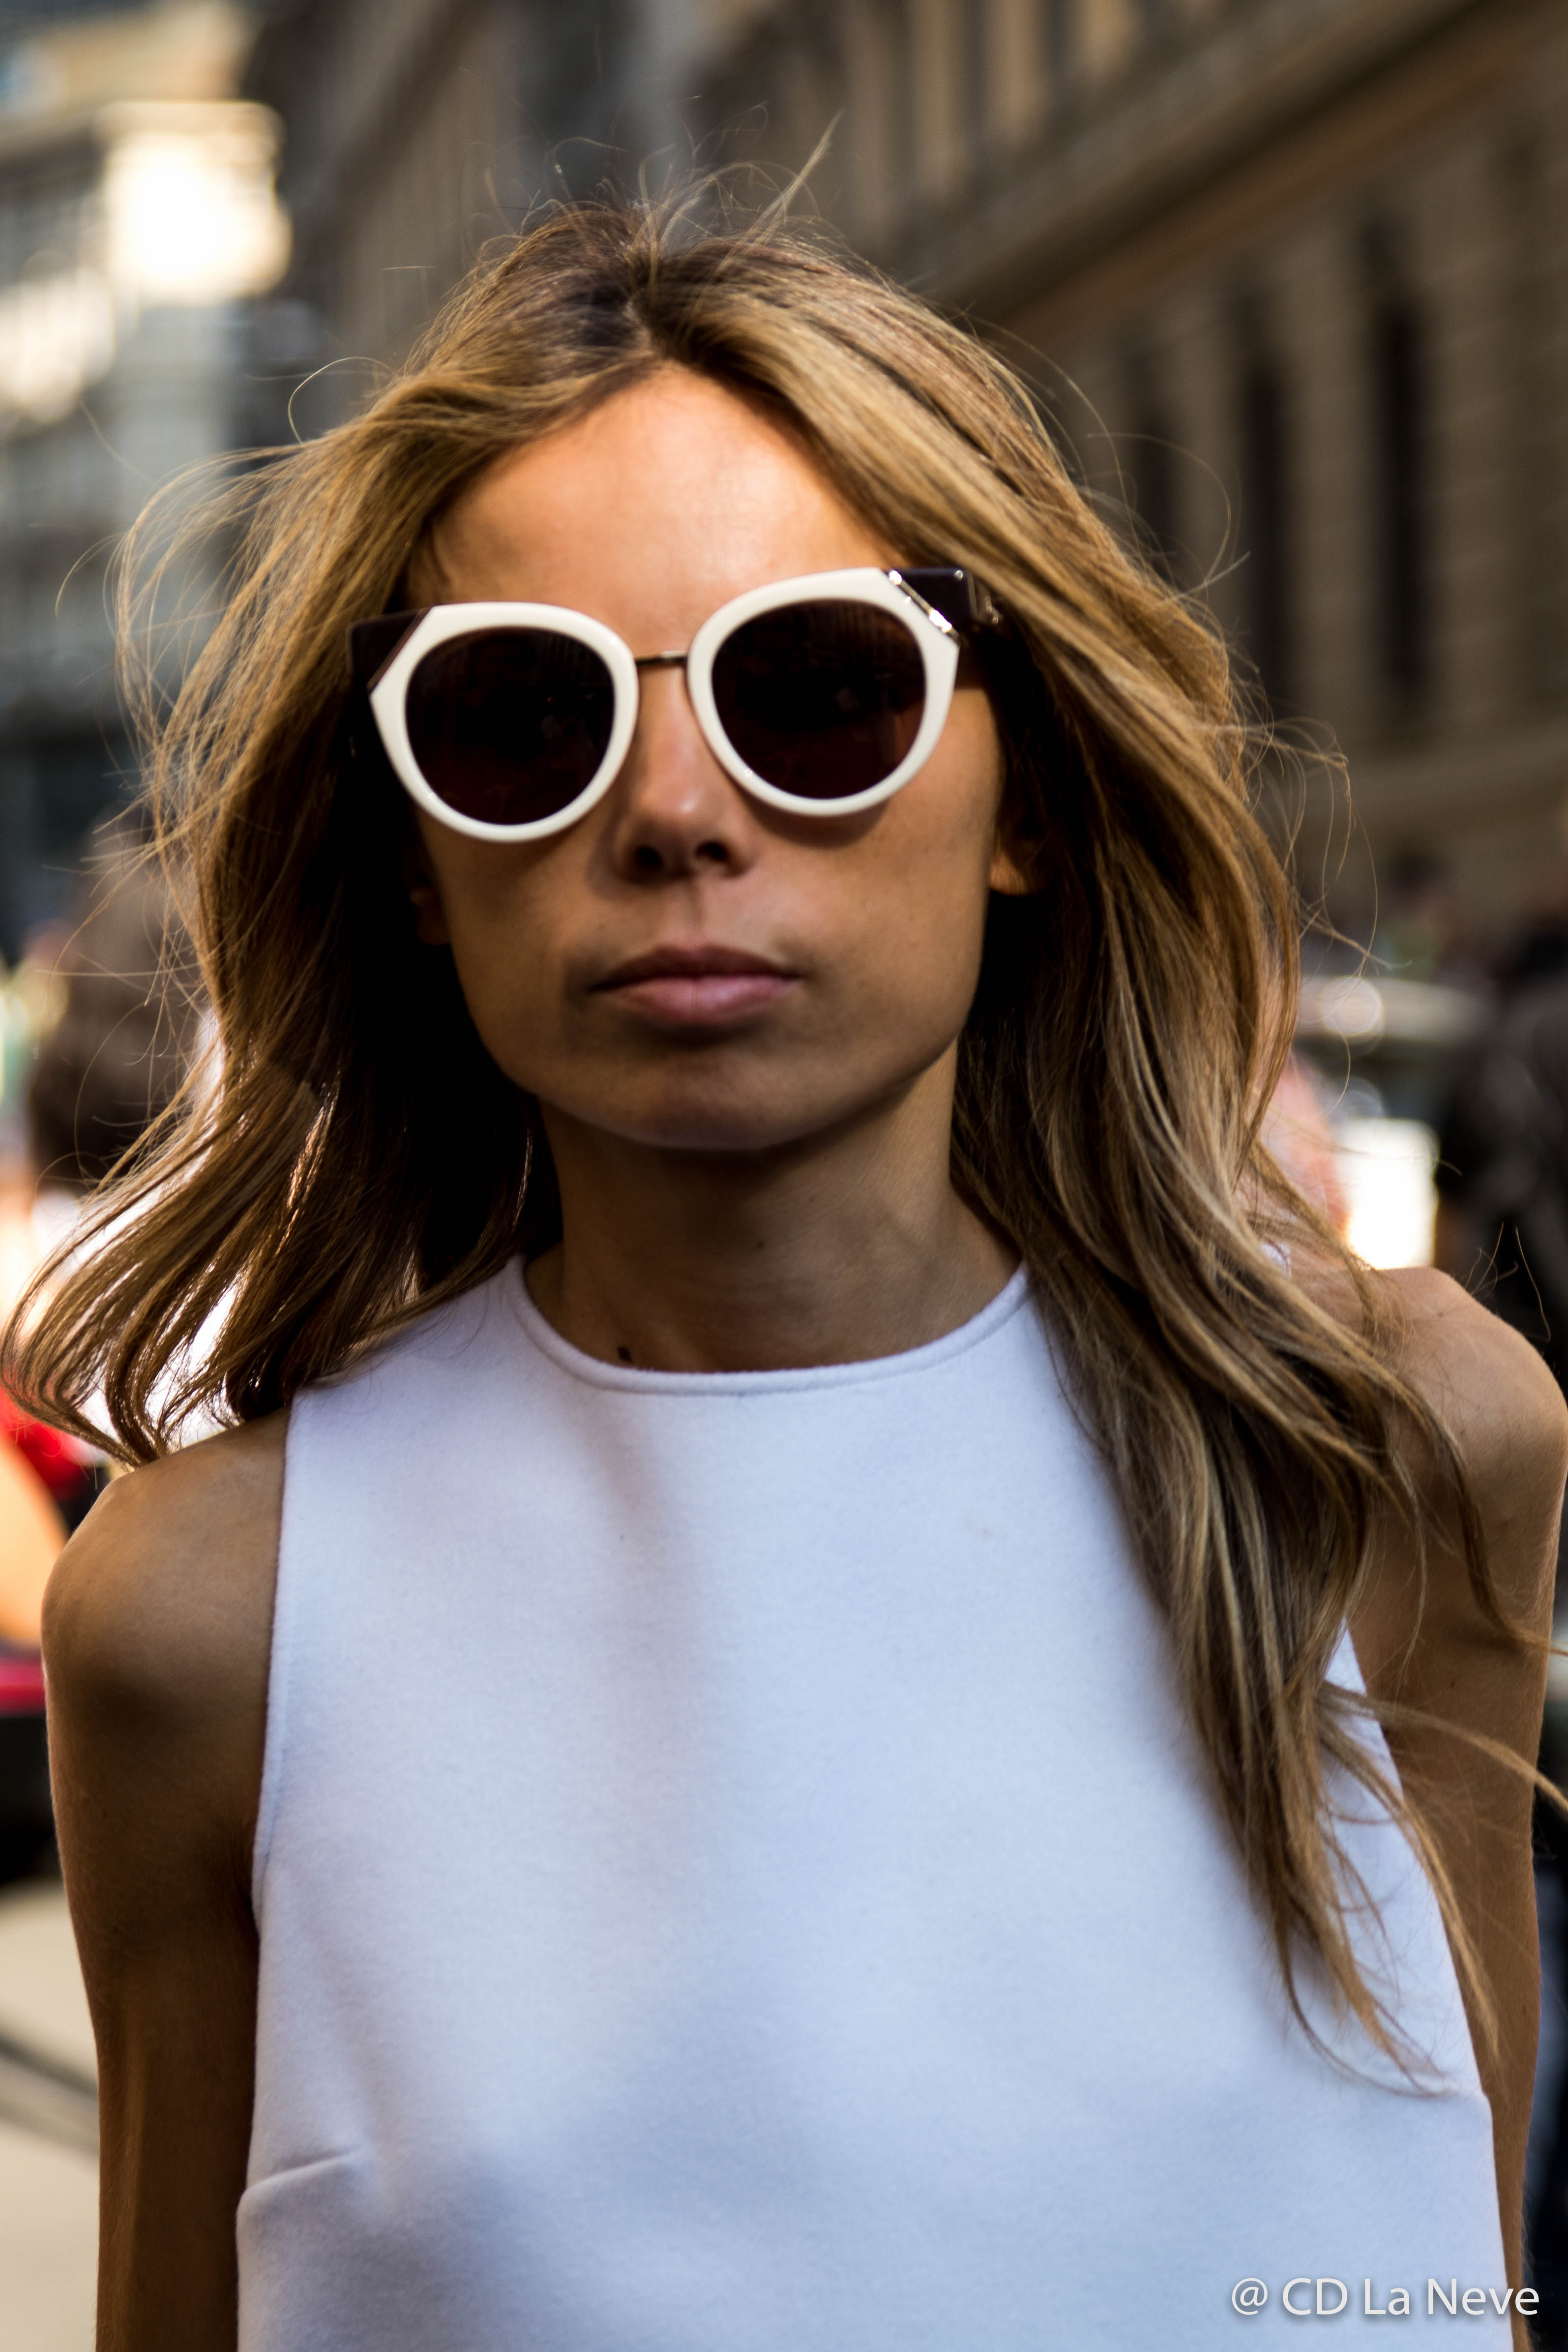 Erica Pelosini Milan Fashion Week Street Style